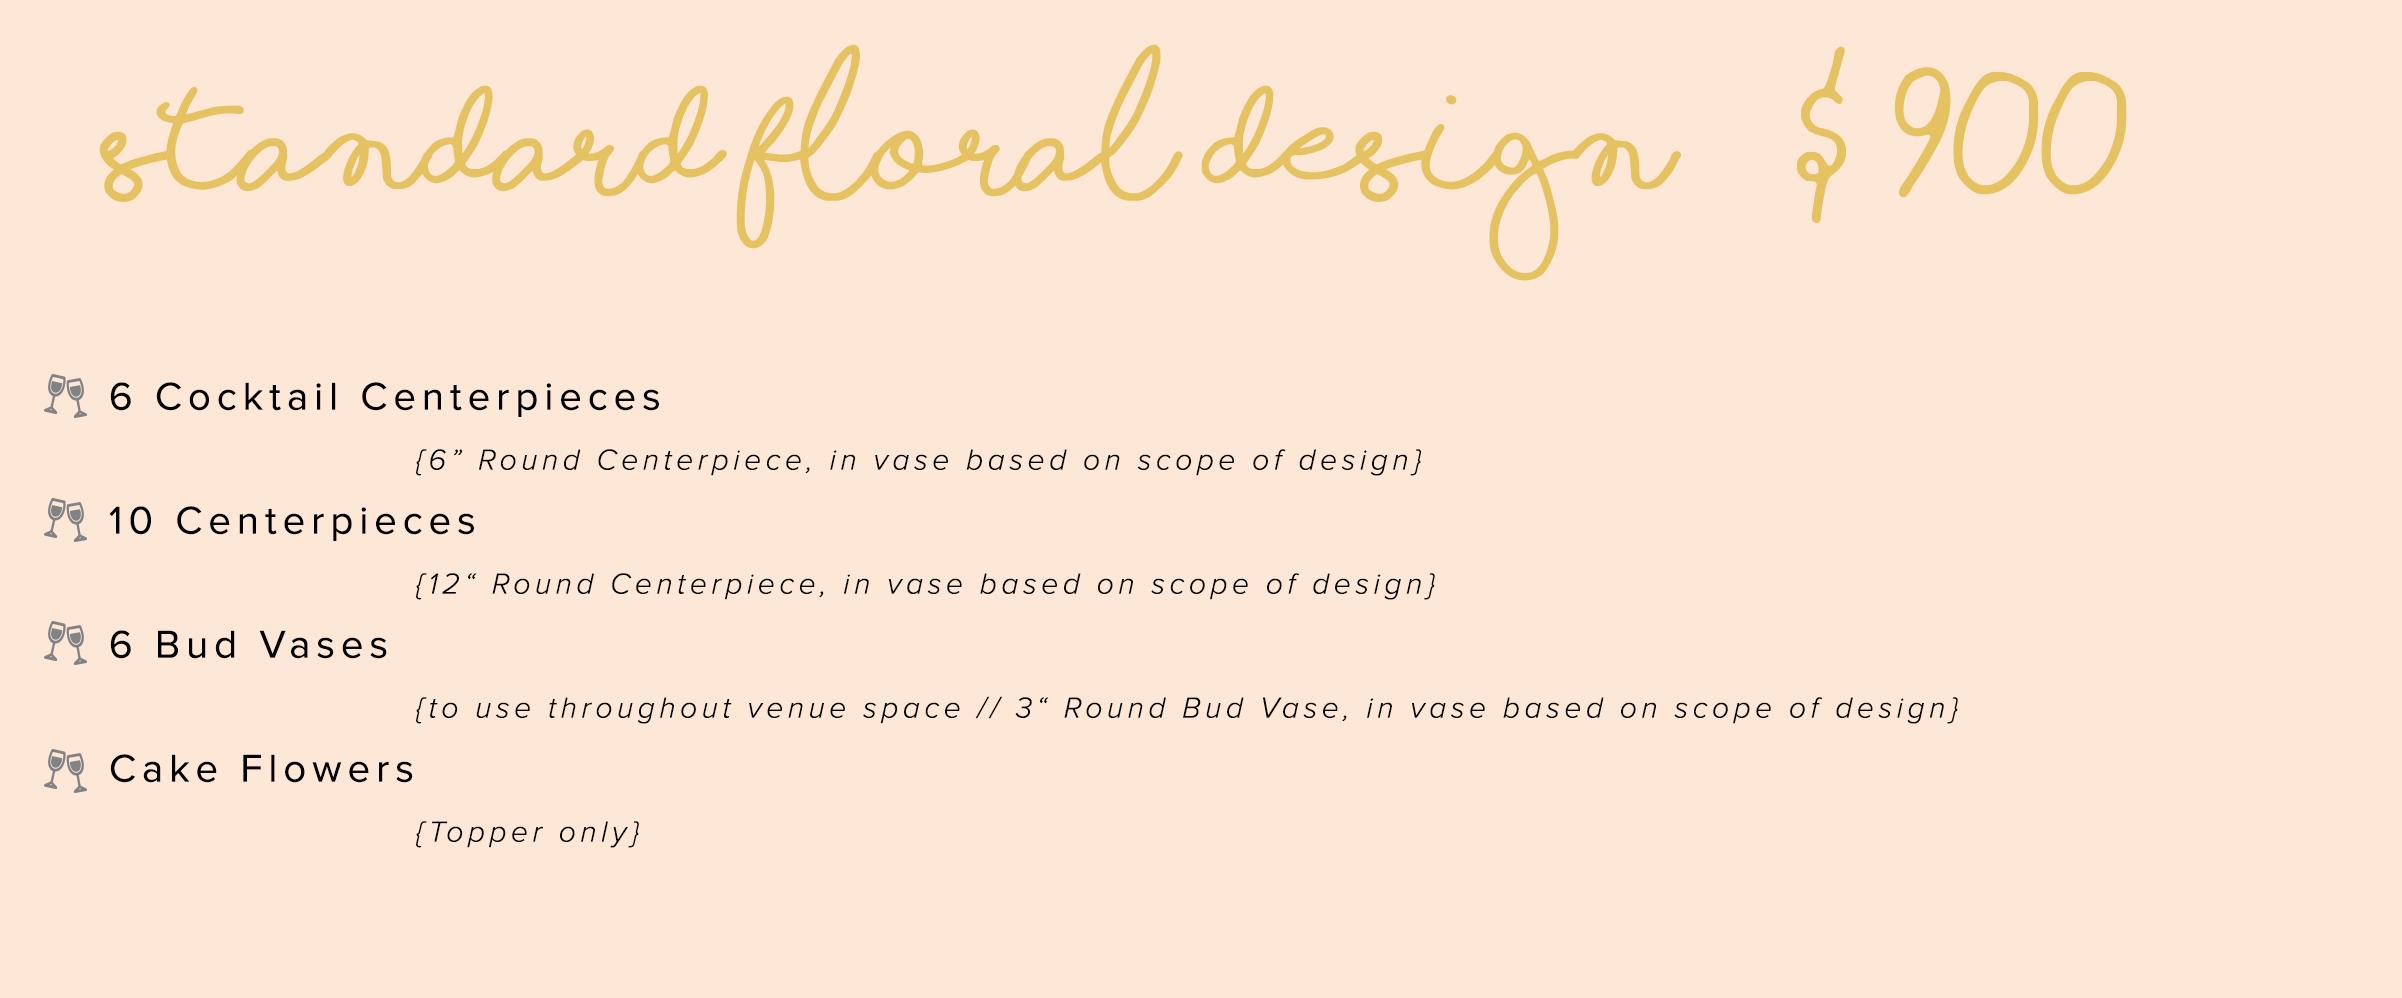 party_standard_flower_design.jpg